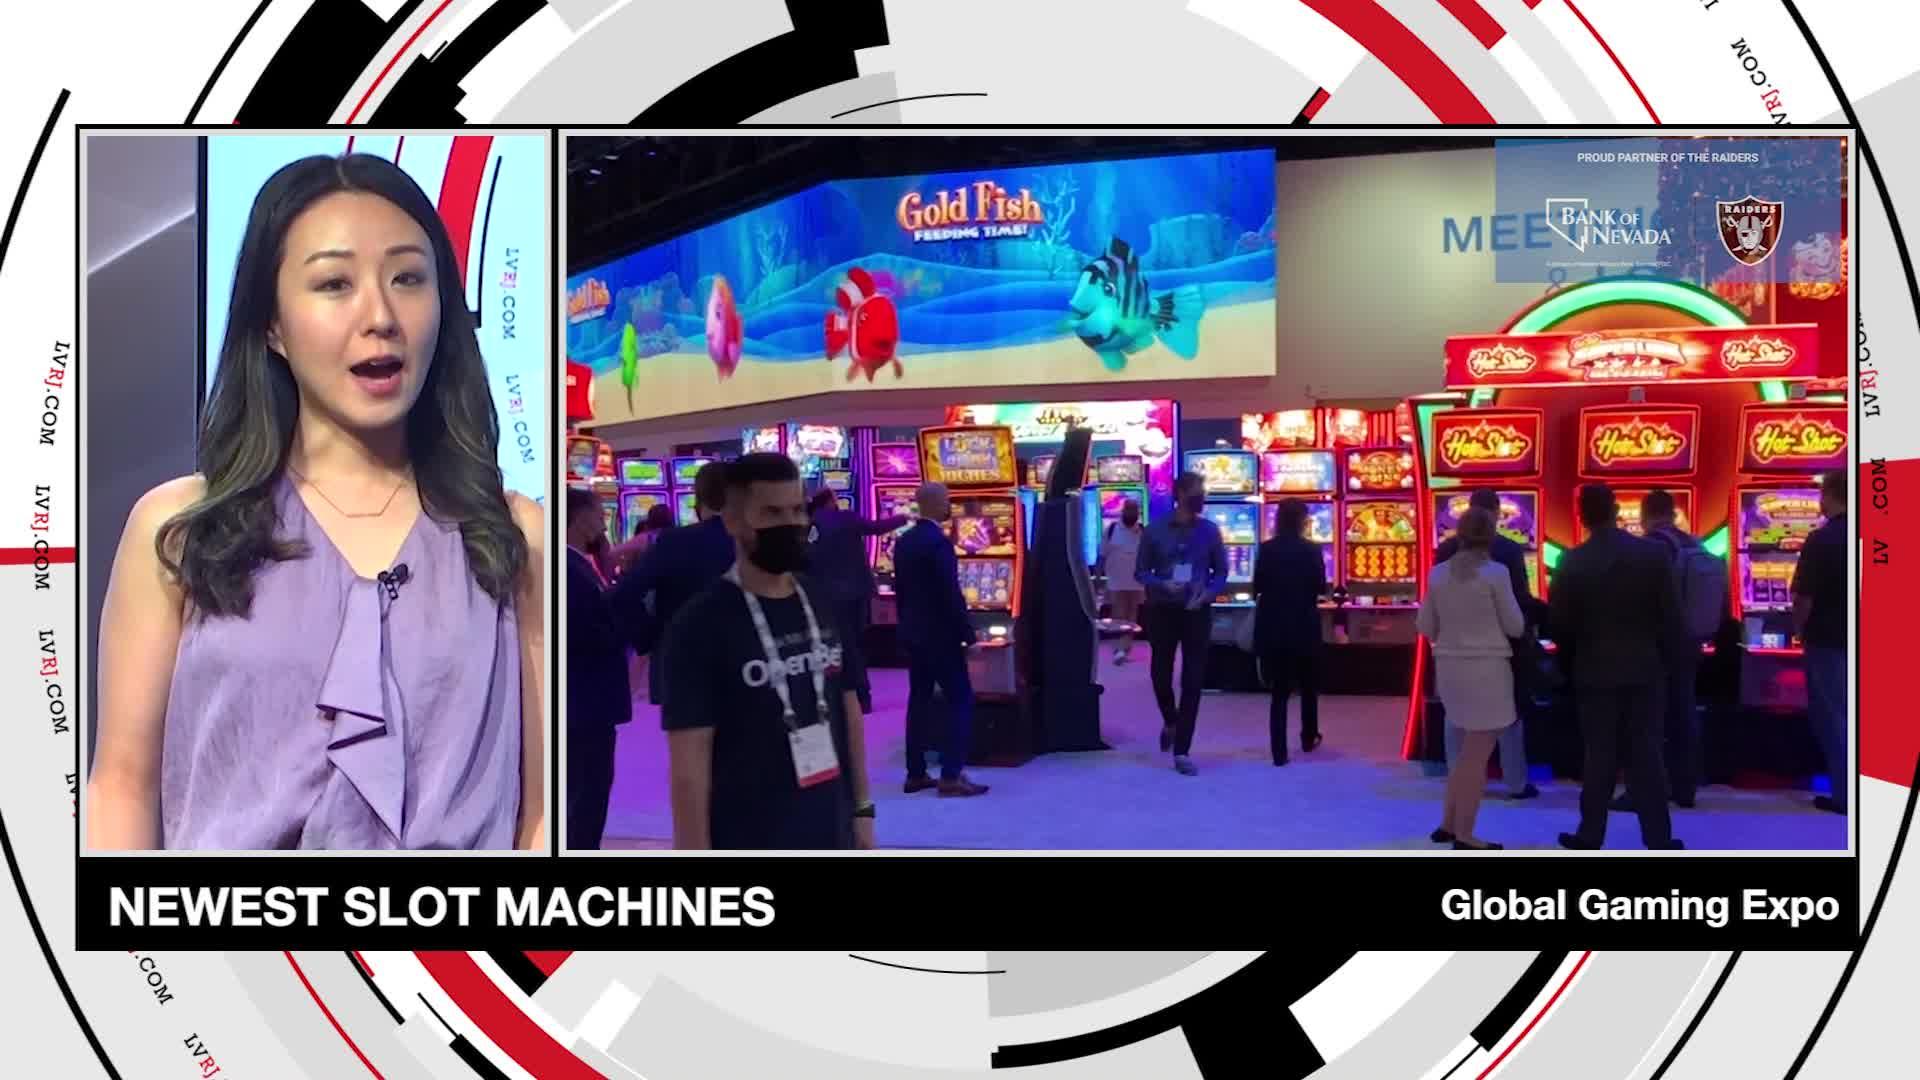 7@7PM Newest Slot Machines at G@E